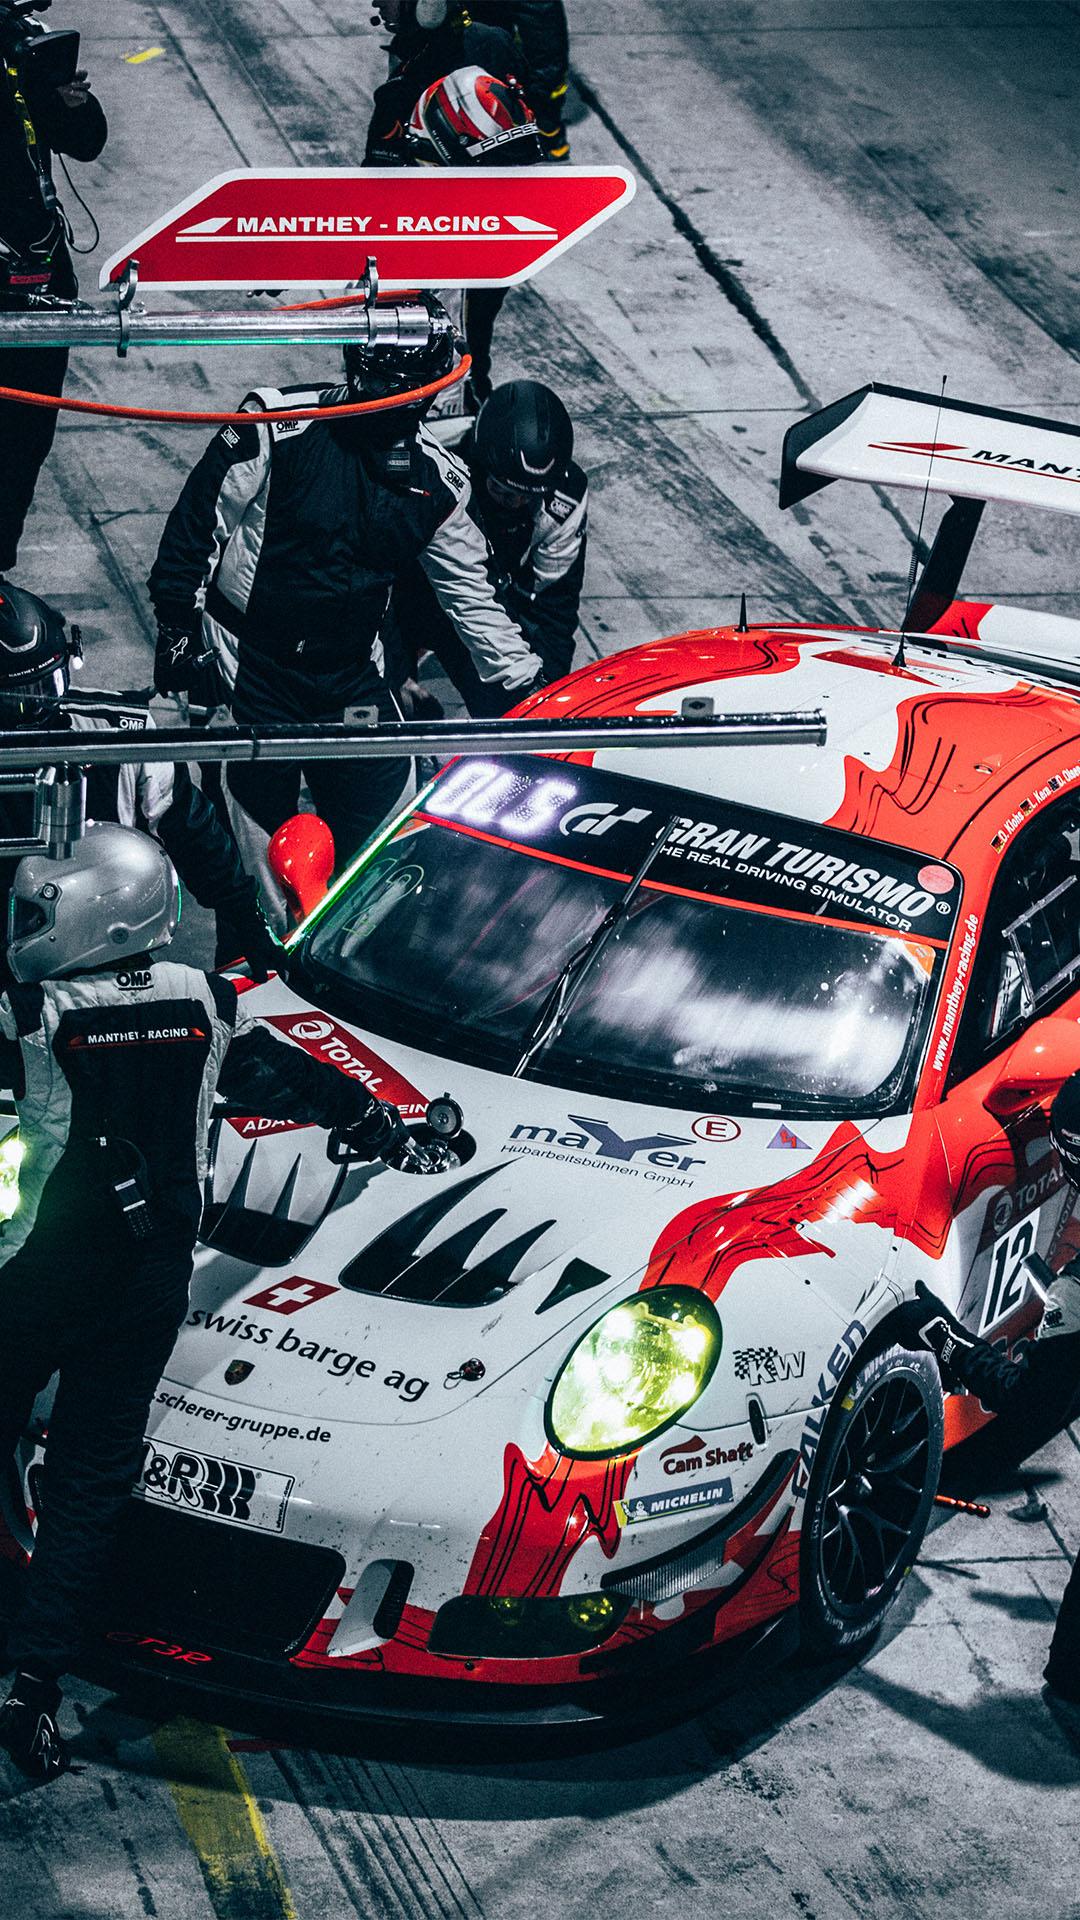 Downloads Wallpaper Iphone 7 8 Plus Manthey Racing